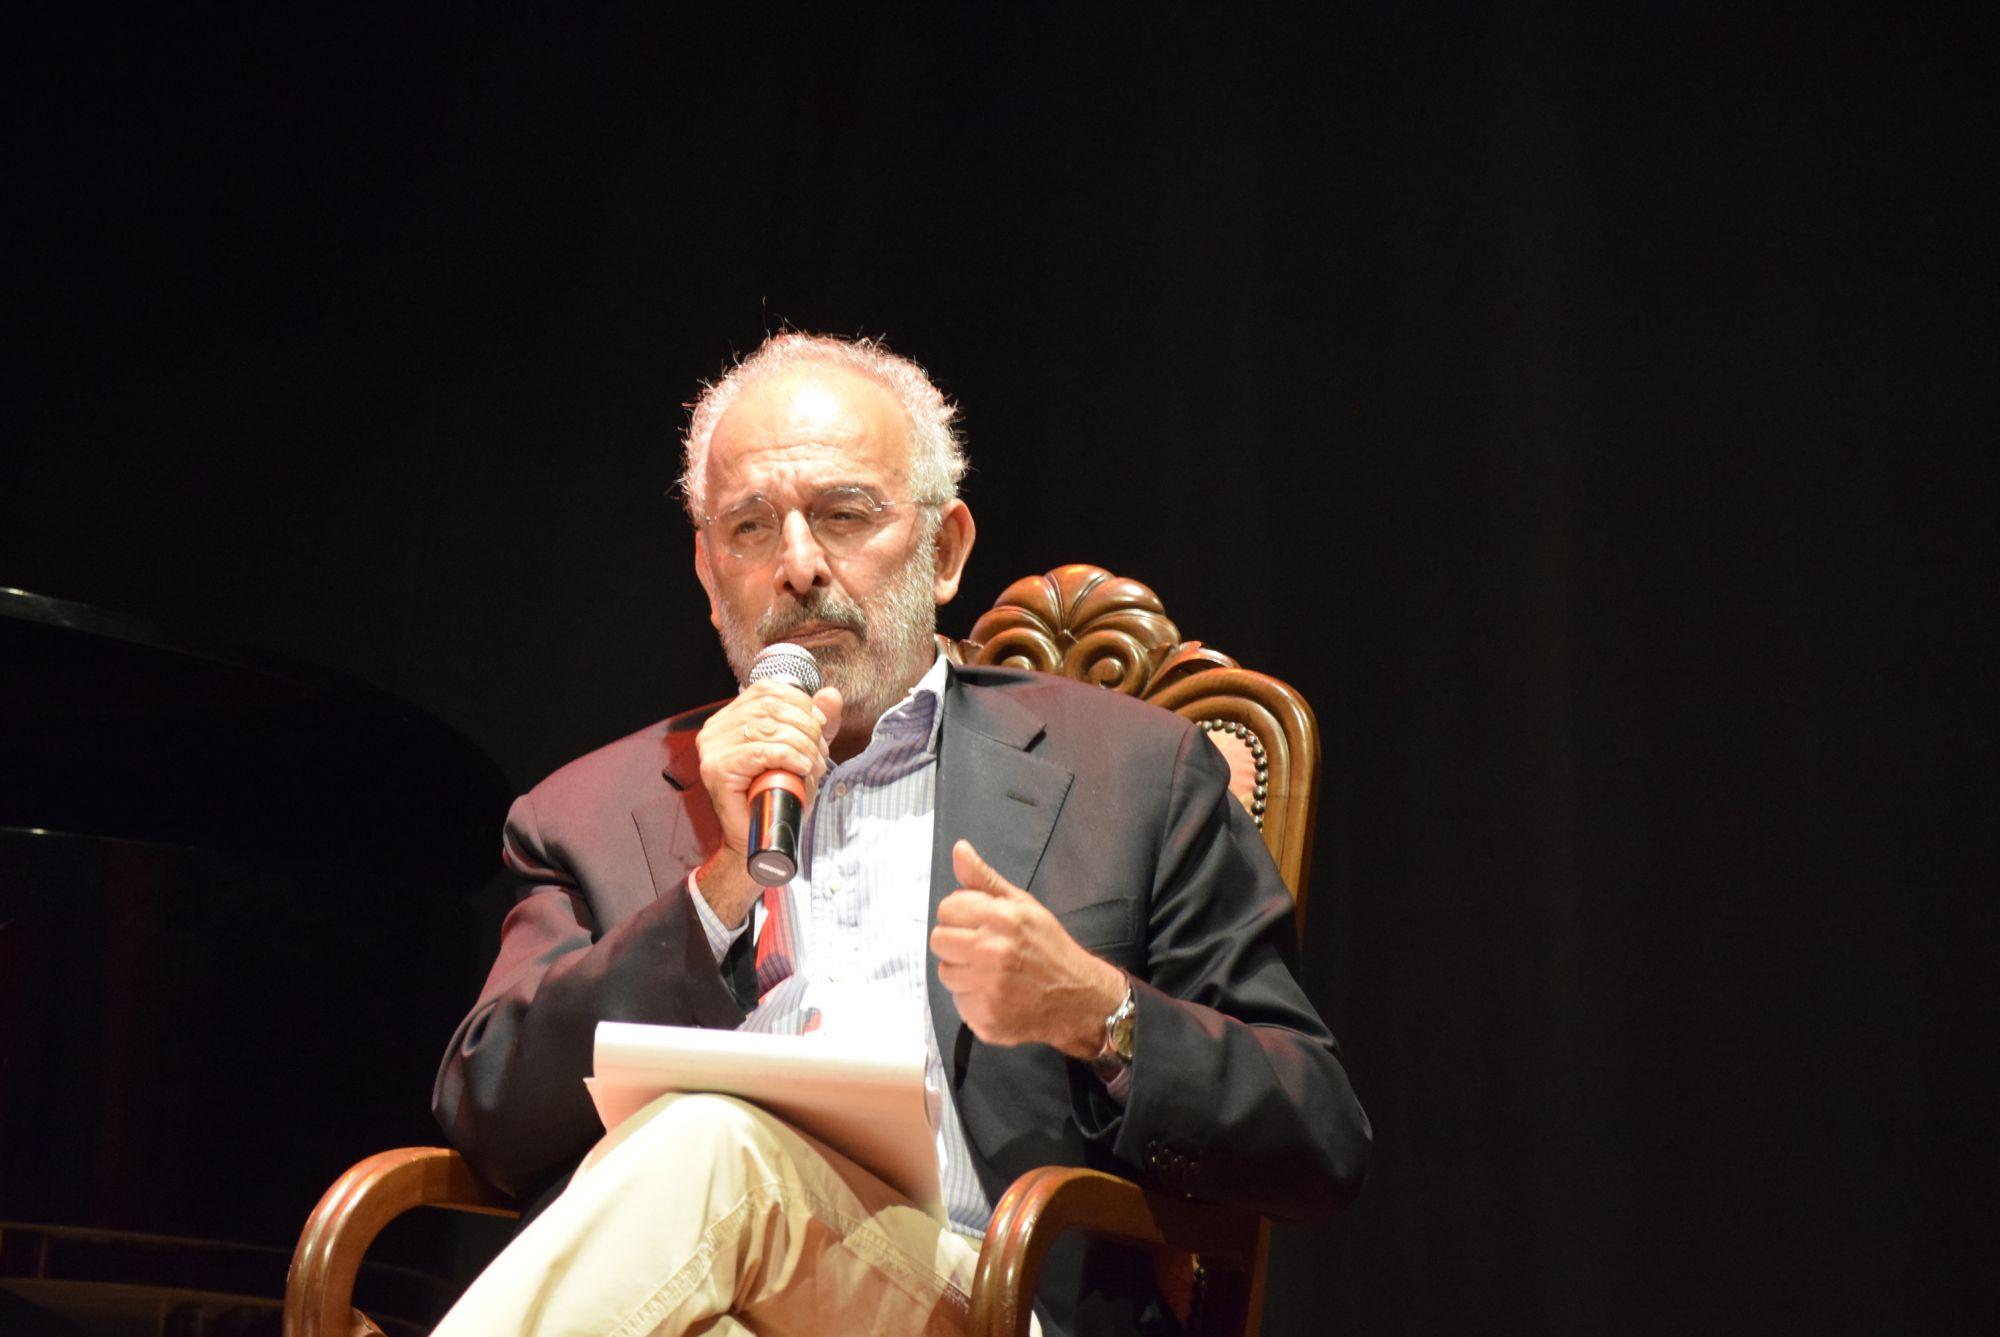 Gad Lerner a Camaiore, la video-intervista